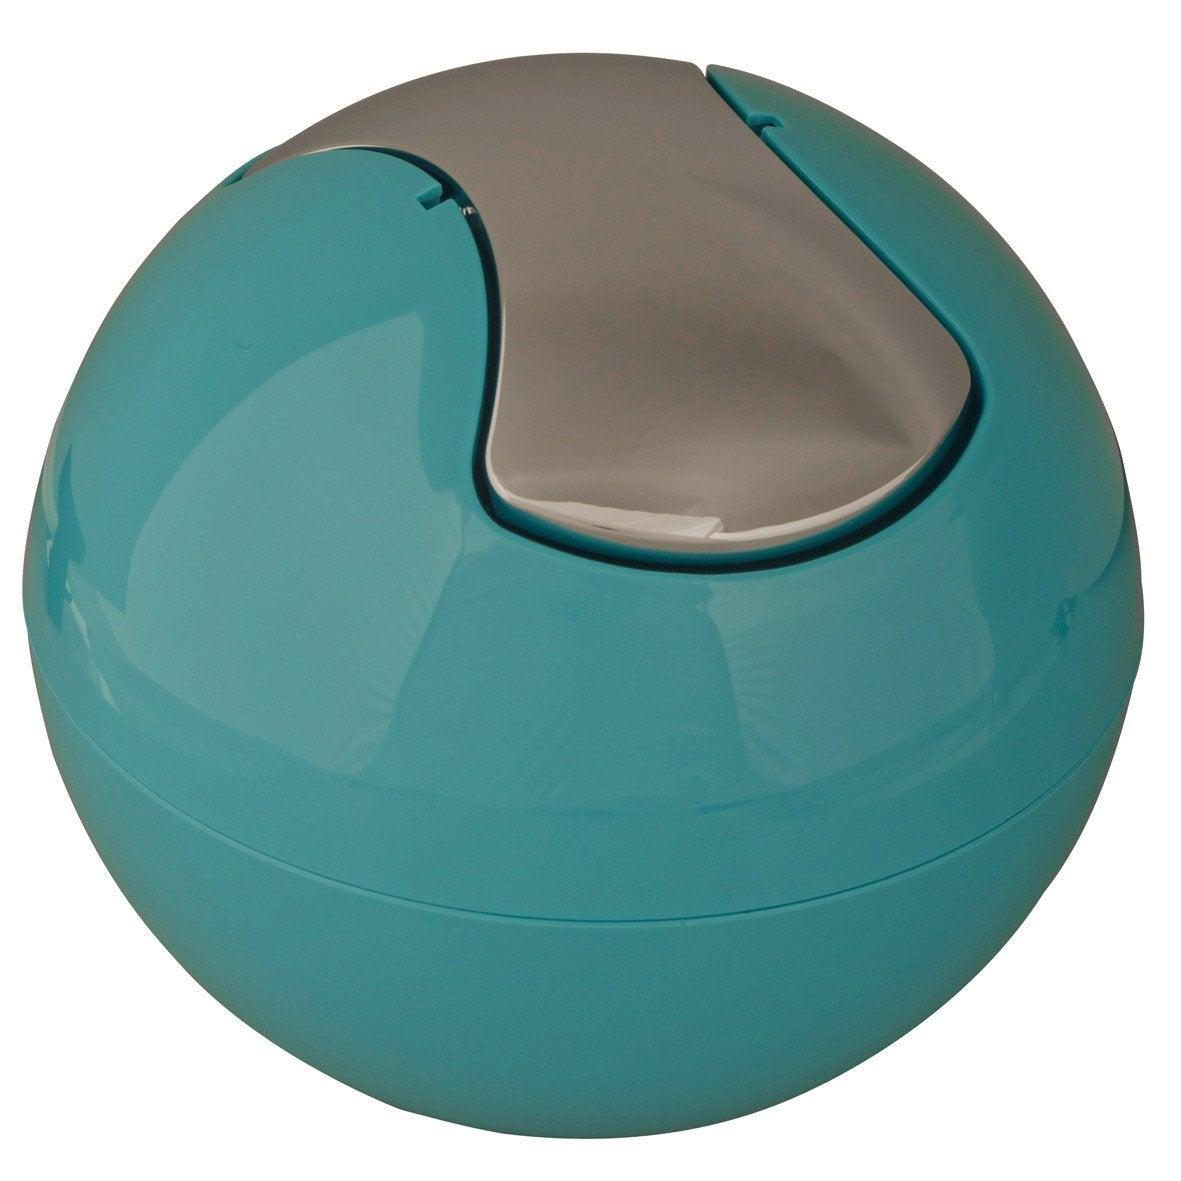 poubelle de salle de bains bowl, bleu atoll n°4  leroy merlin